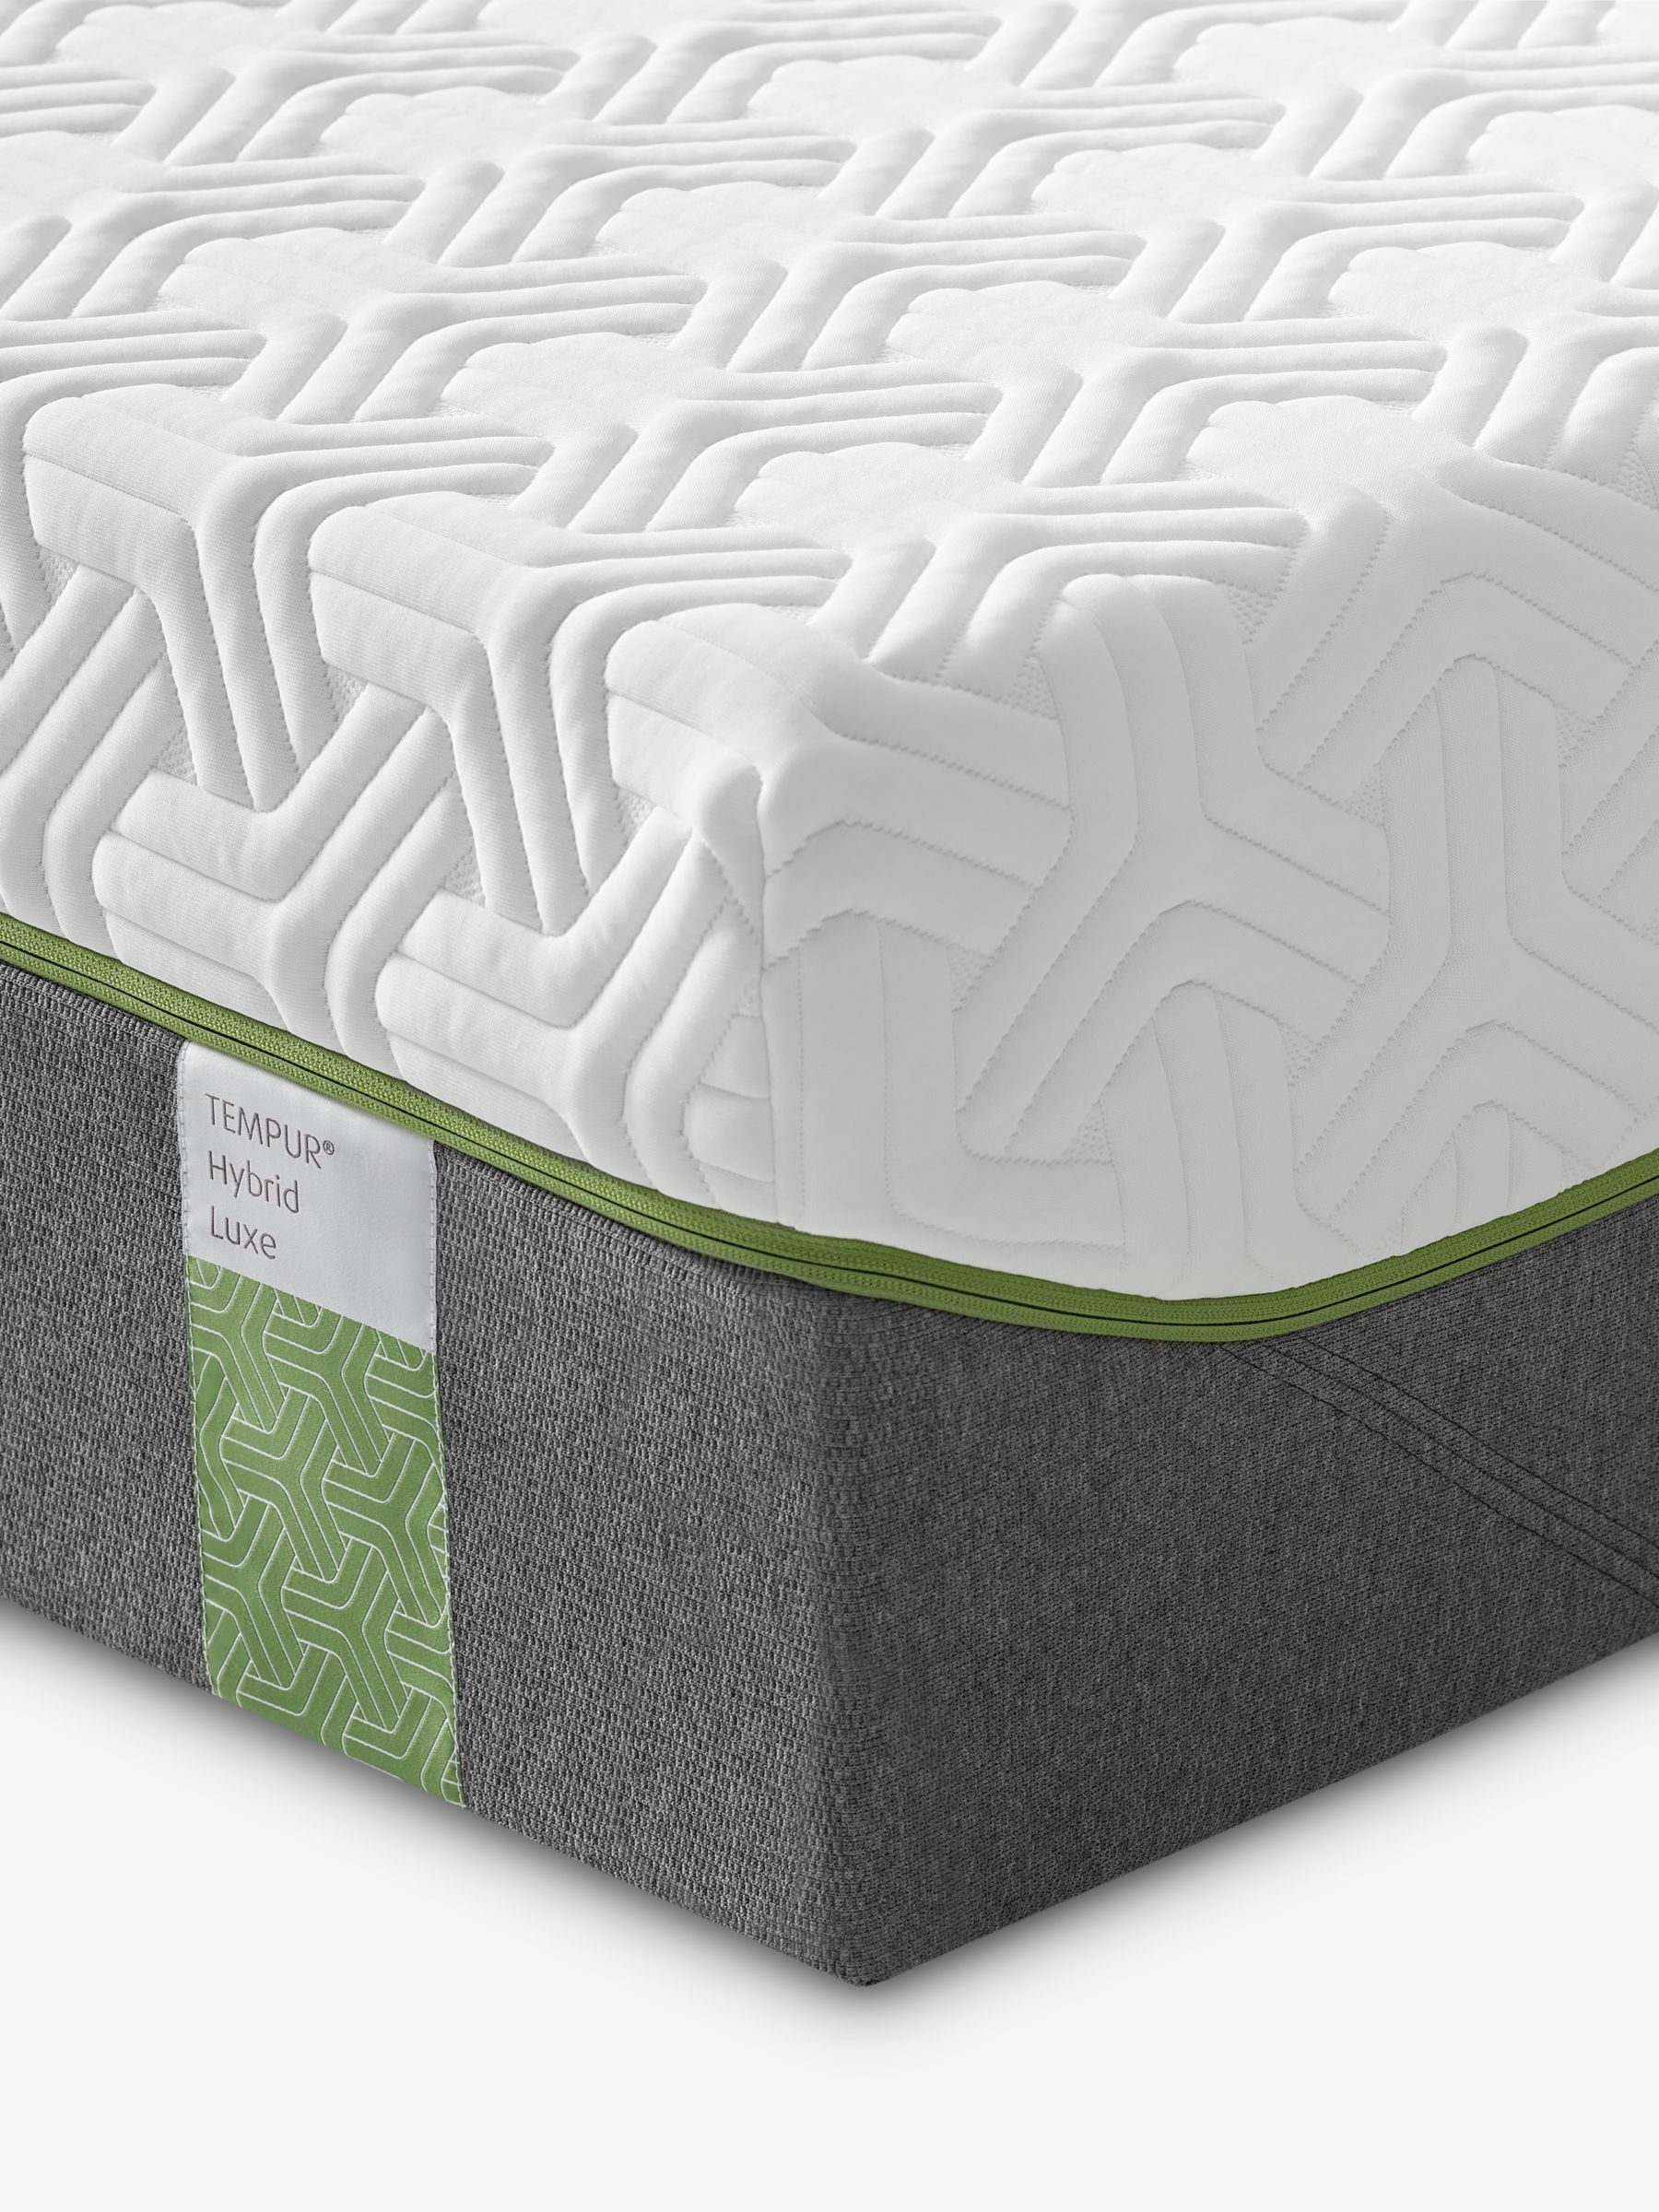 Tempur Tempur Hybrid Luxe Pocket Spring Memory Foam Mattress, Single